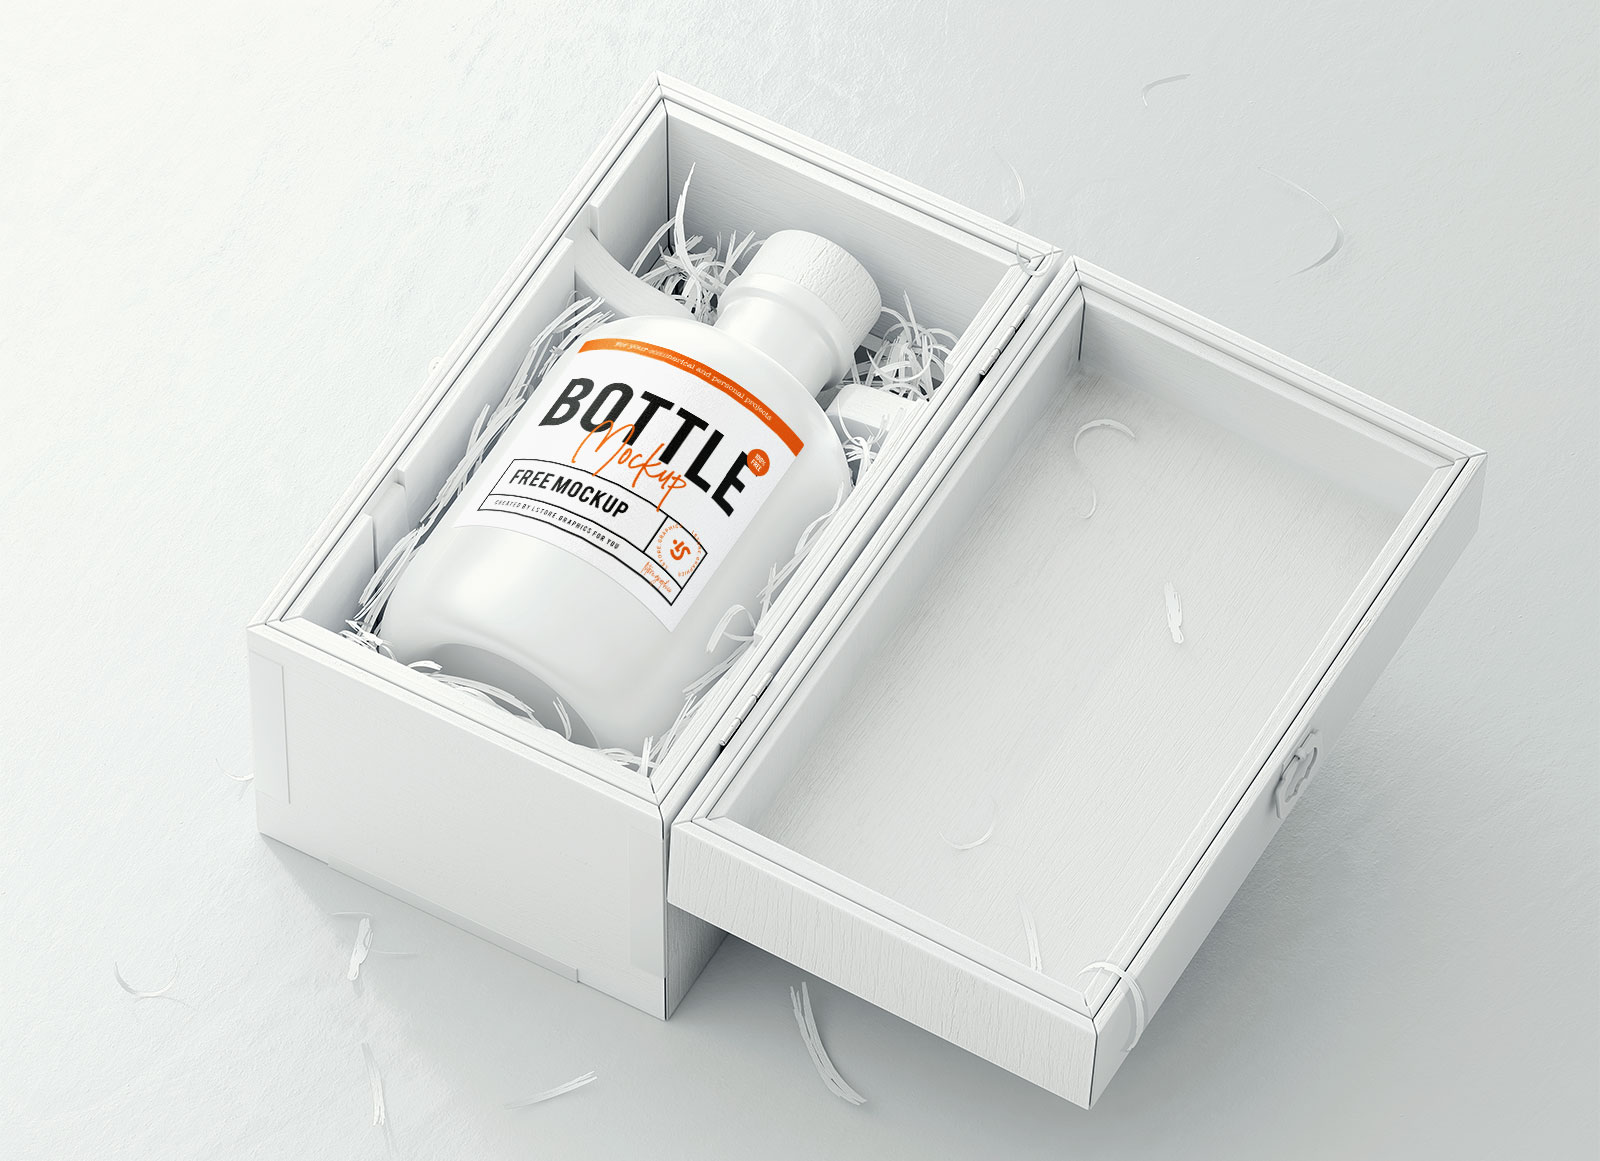 Free-White-Bottle-Mockup-PSD